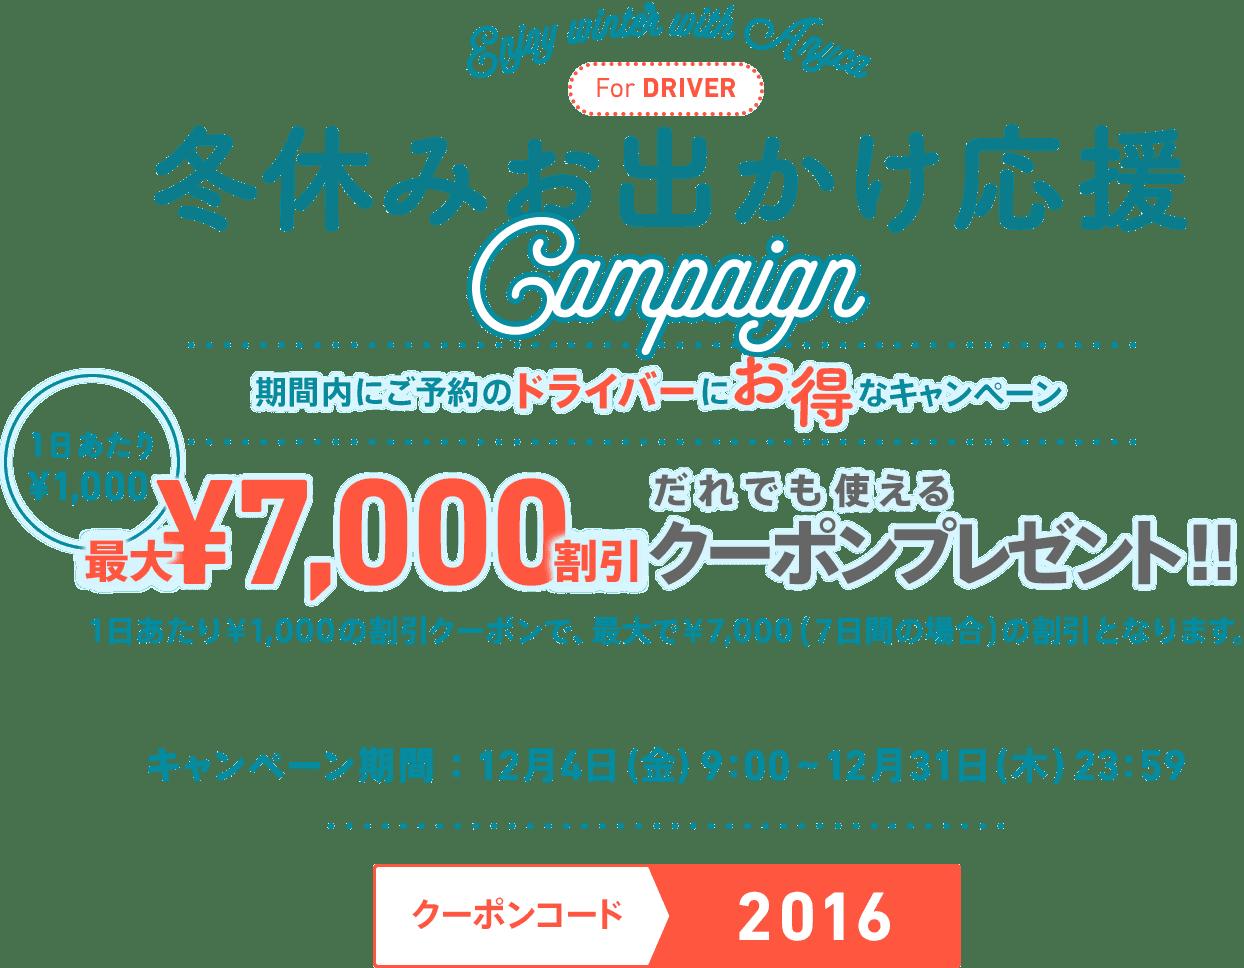 Anyca campaign in 2015 winter